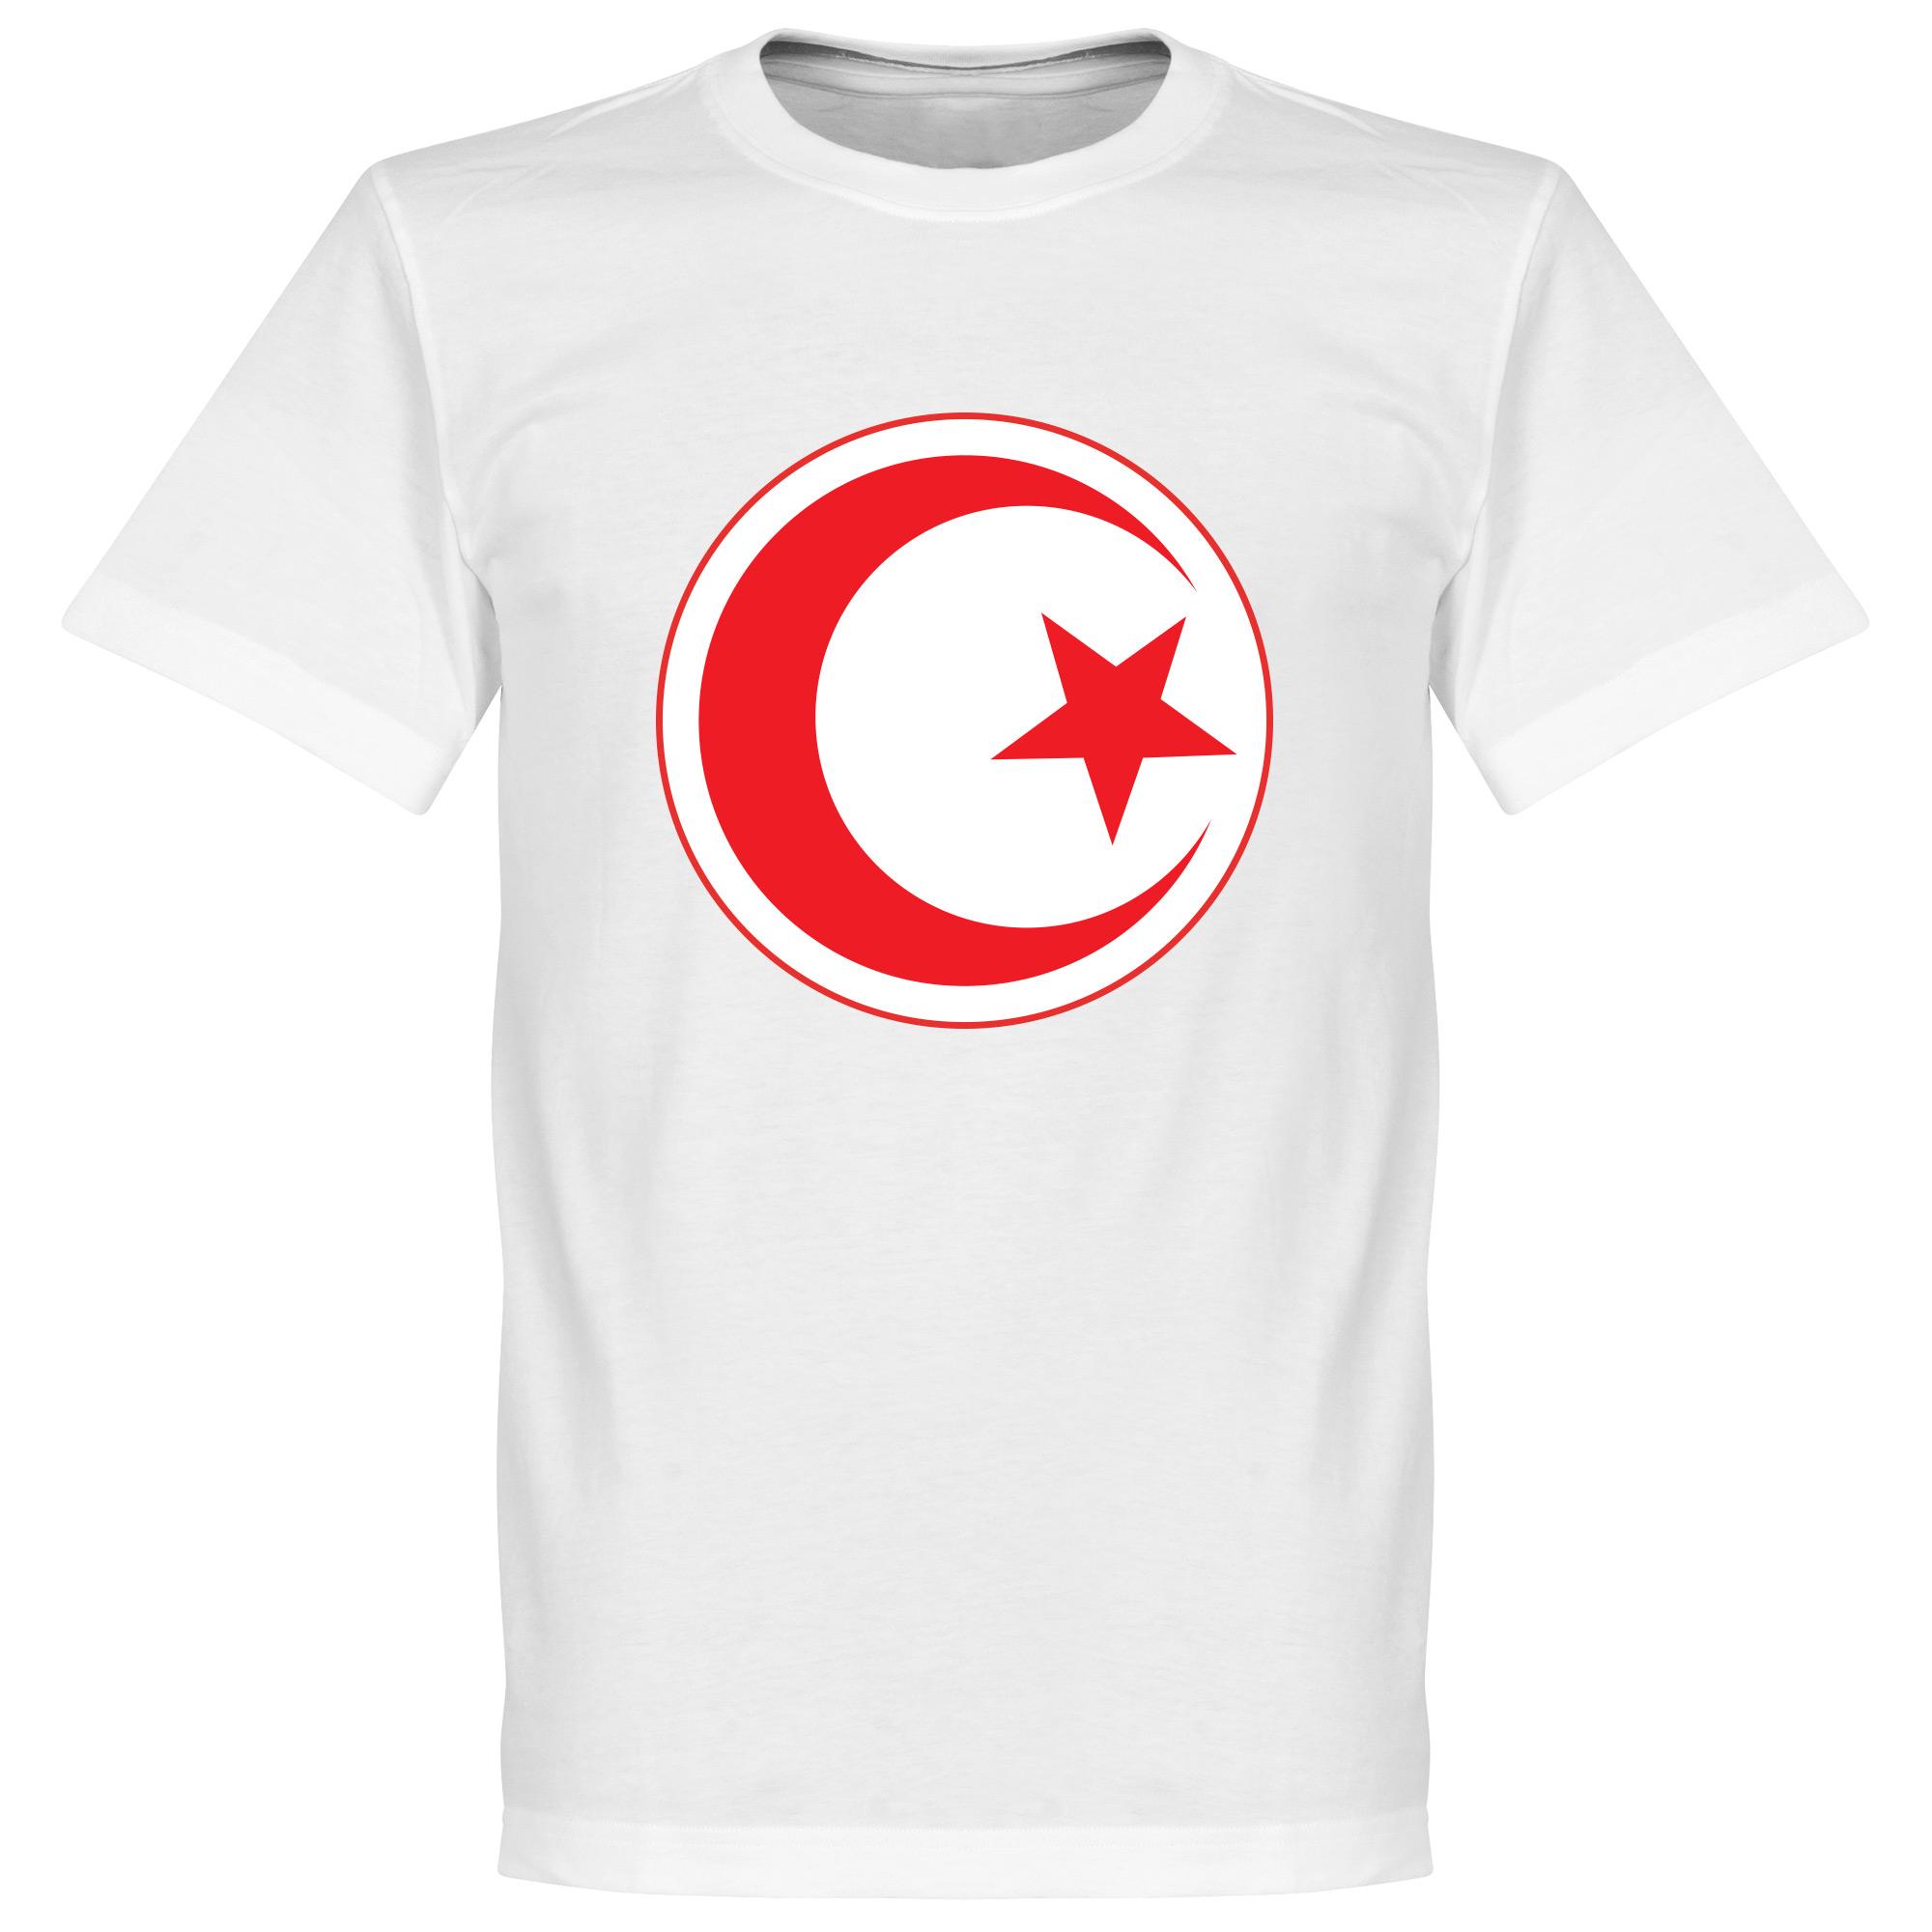 Tunisia Crest Tee - White - S